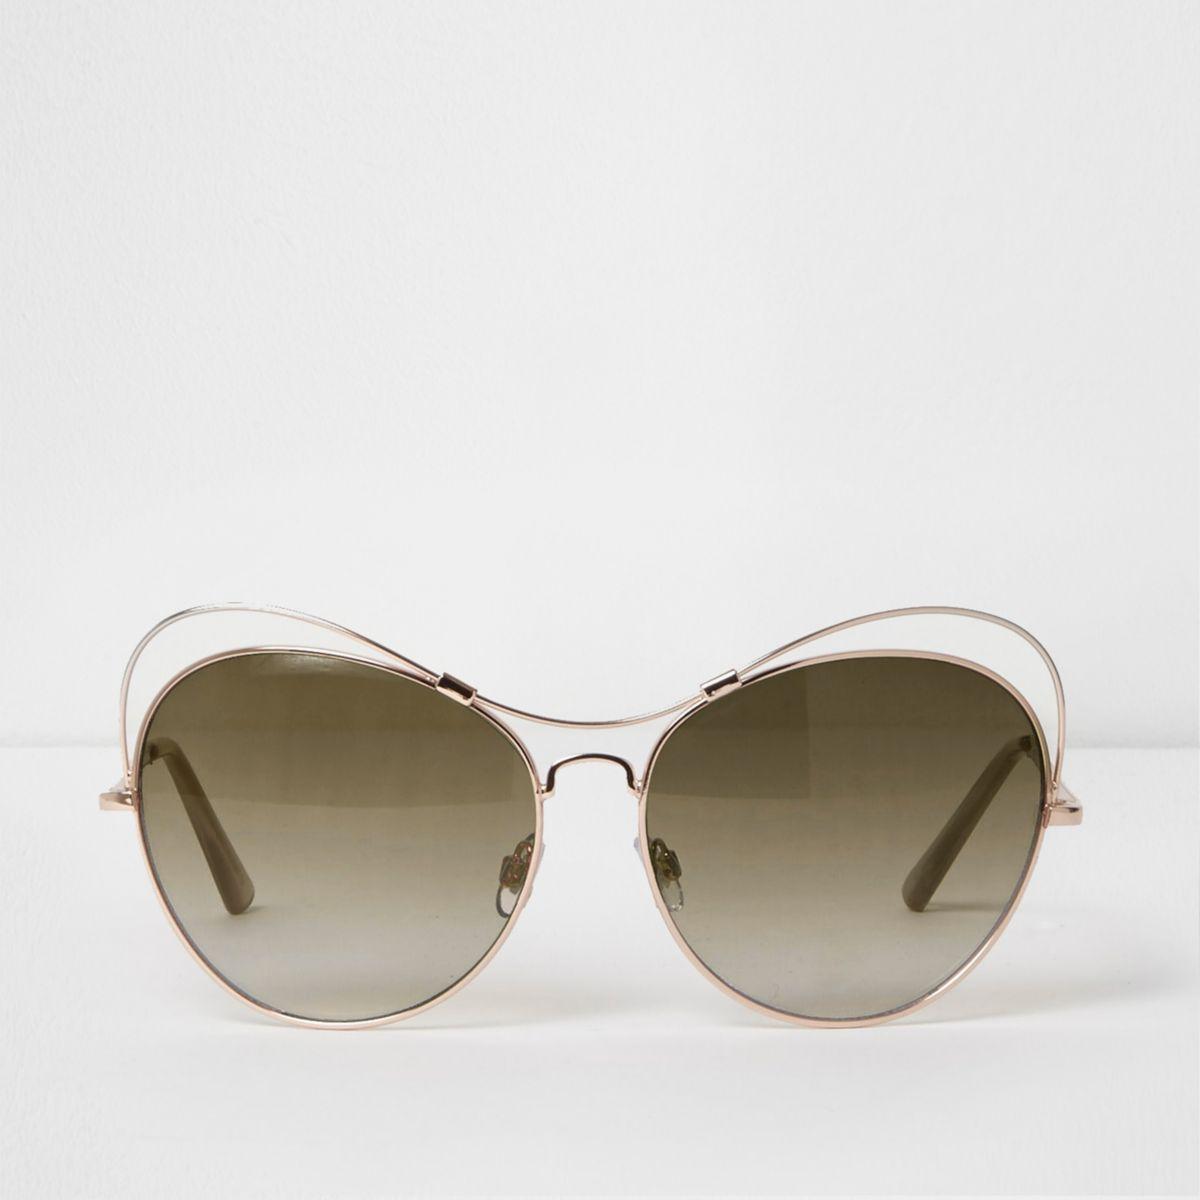 Gold tone cut out glam sunglasses